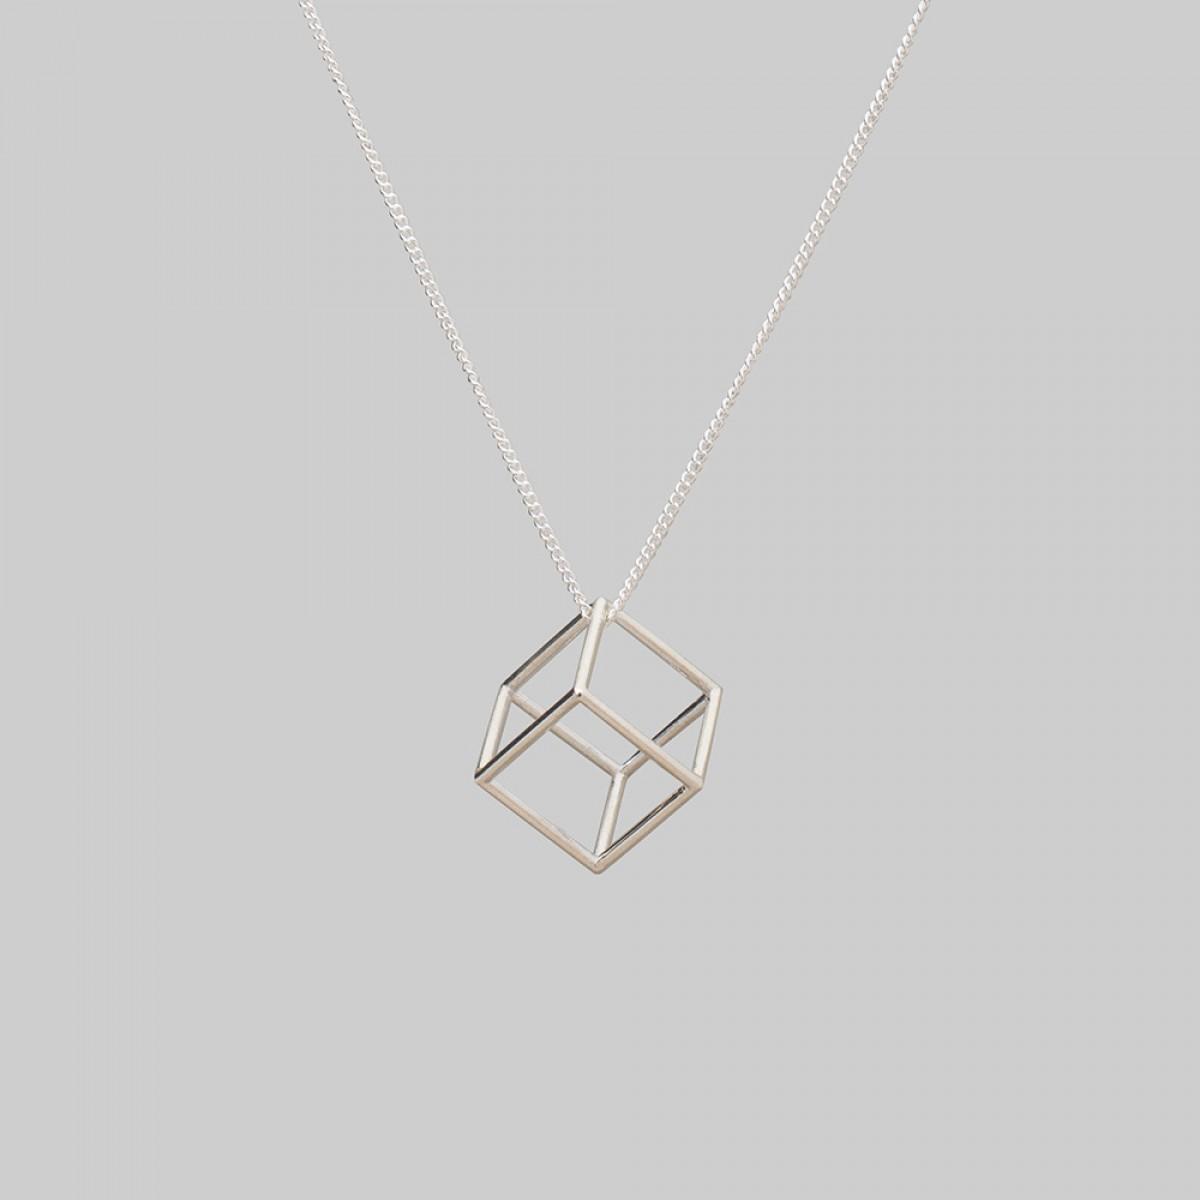 "Teresa Gruber Anhänger ""platonic solids- Hexaeder"", 925 Silber"